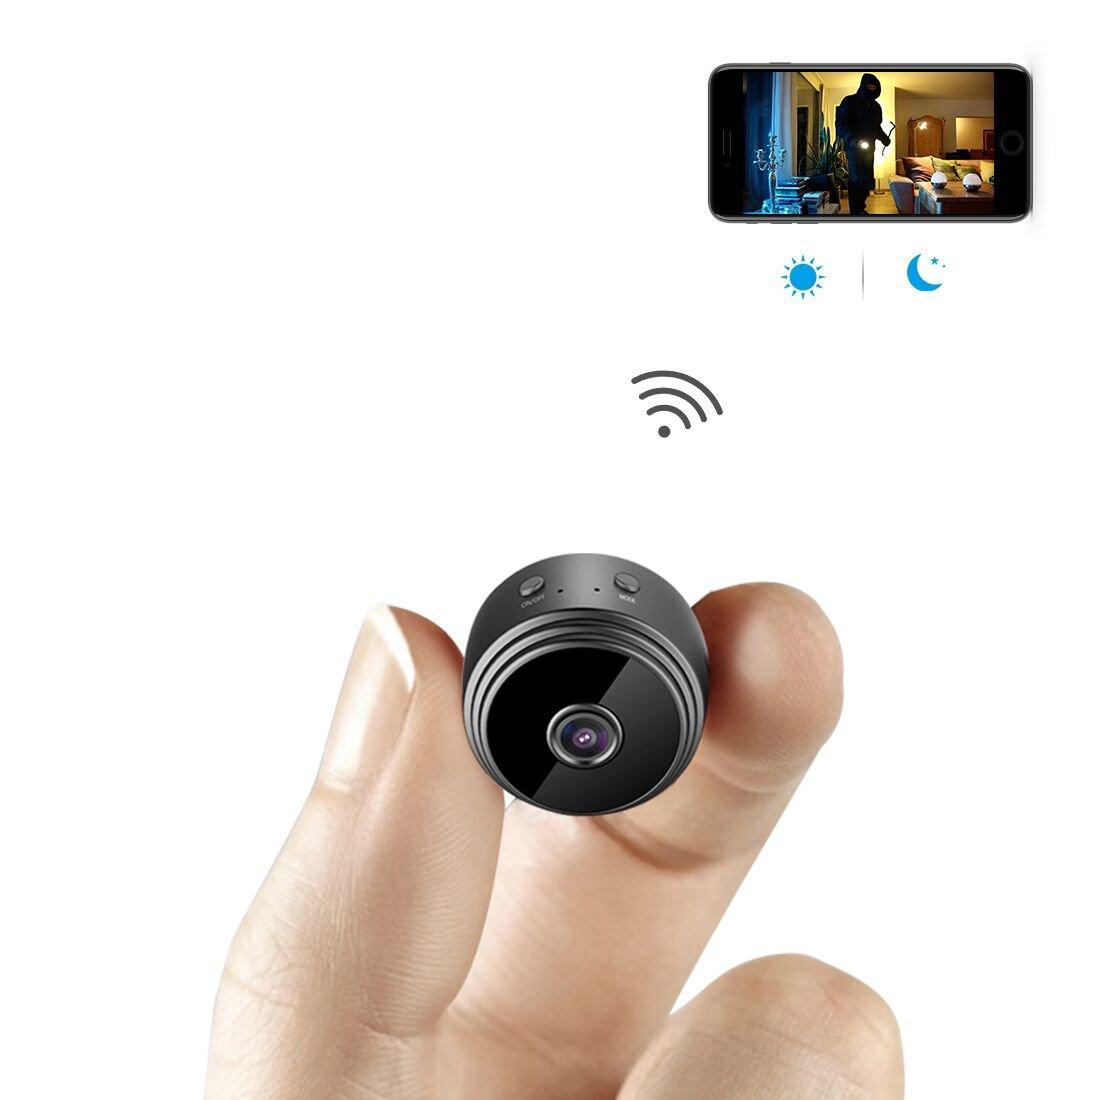 Mini-Kamera, TODAYI Wireless Wifi Mini WLAN Ü berwachung Kamera Kindermä dchen-Kamera mit Bewegungserkennung fü r iPhone/Android Phone/iPad Shenzhen Tuodayi Technology Co. Ltd.